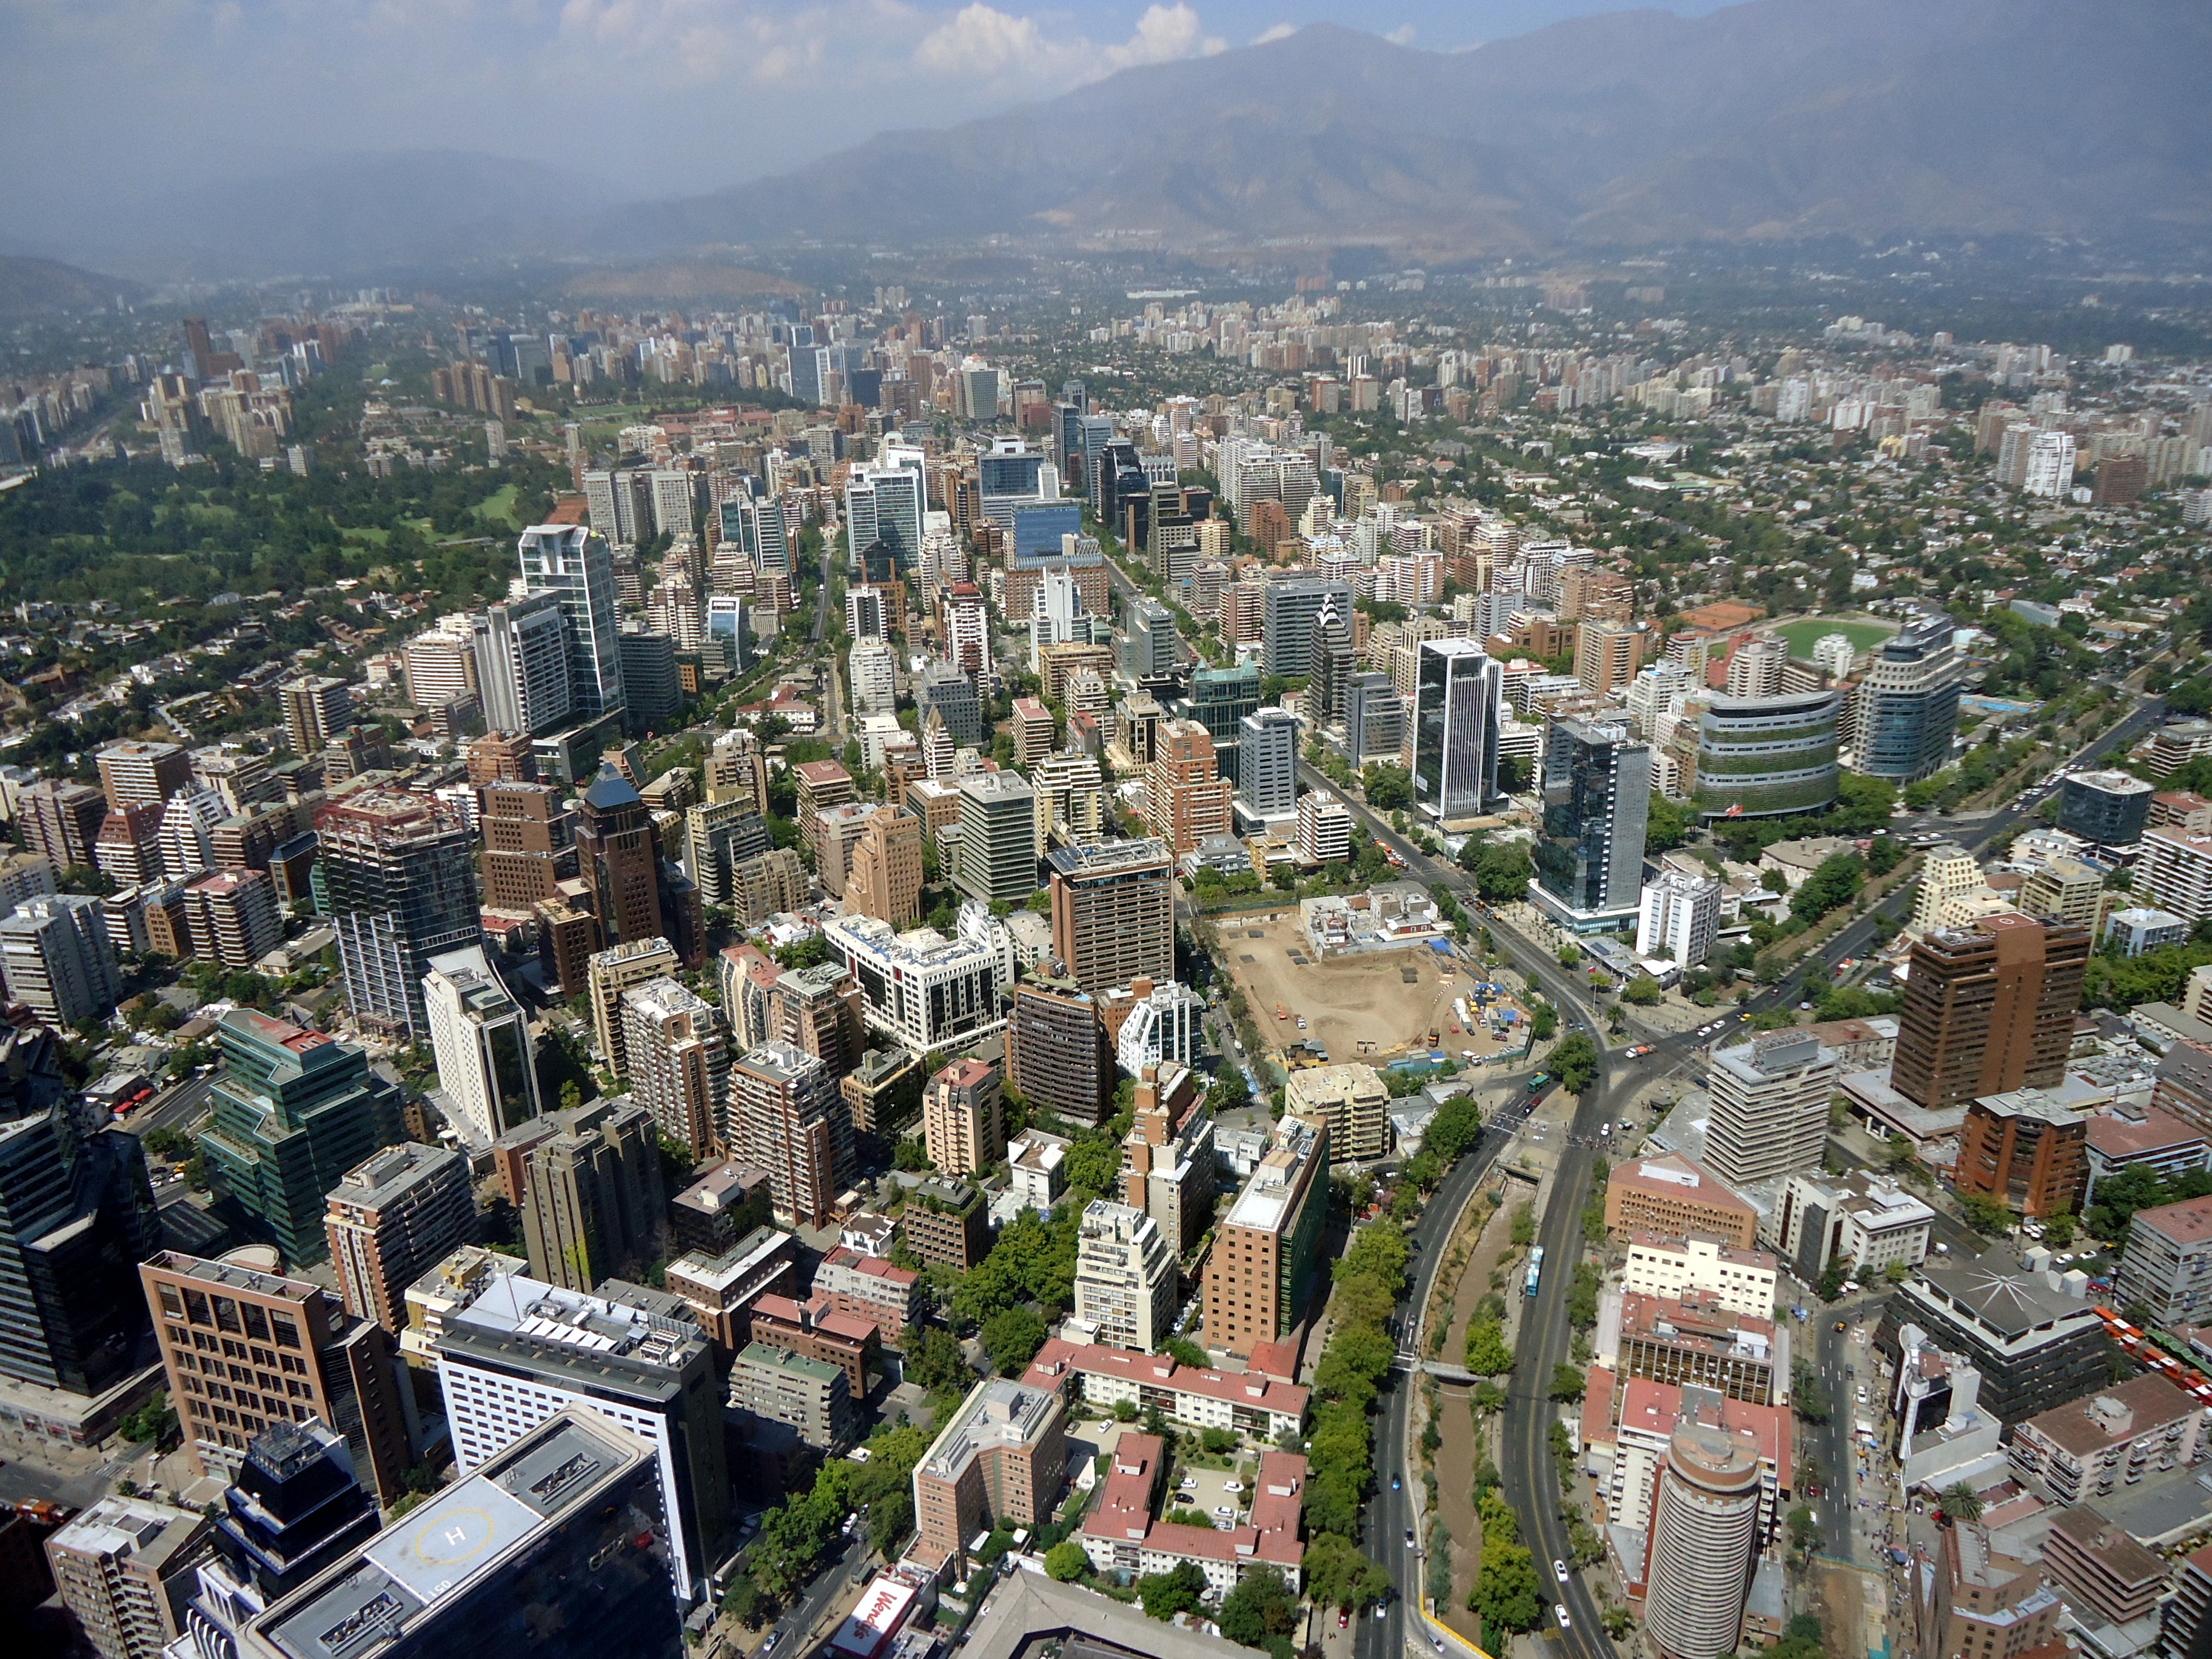 Ficheiro:Santiago de Chile from Gran torre Santiago, Apoquindo and Tobalaba Avenues.JPG – Wikipédia, a enciclopédia livre